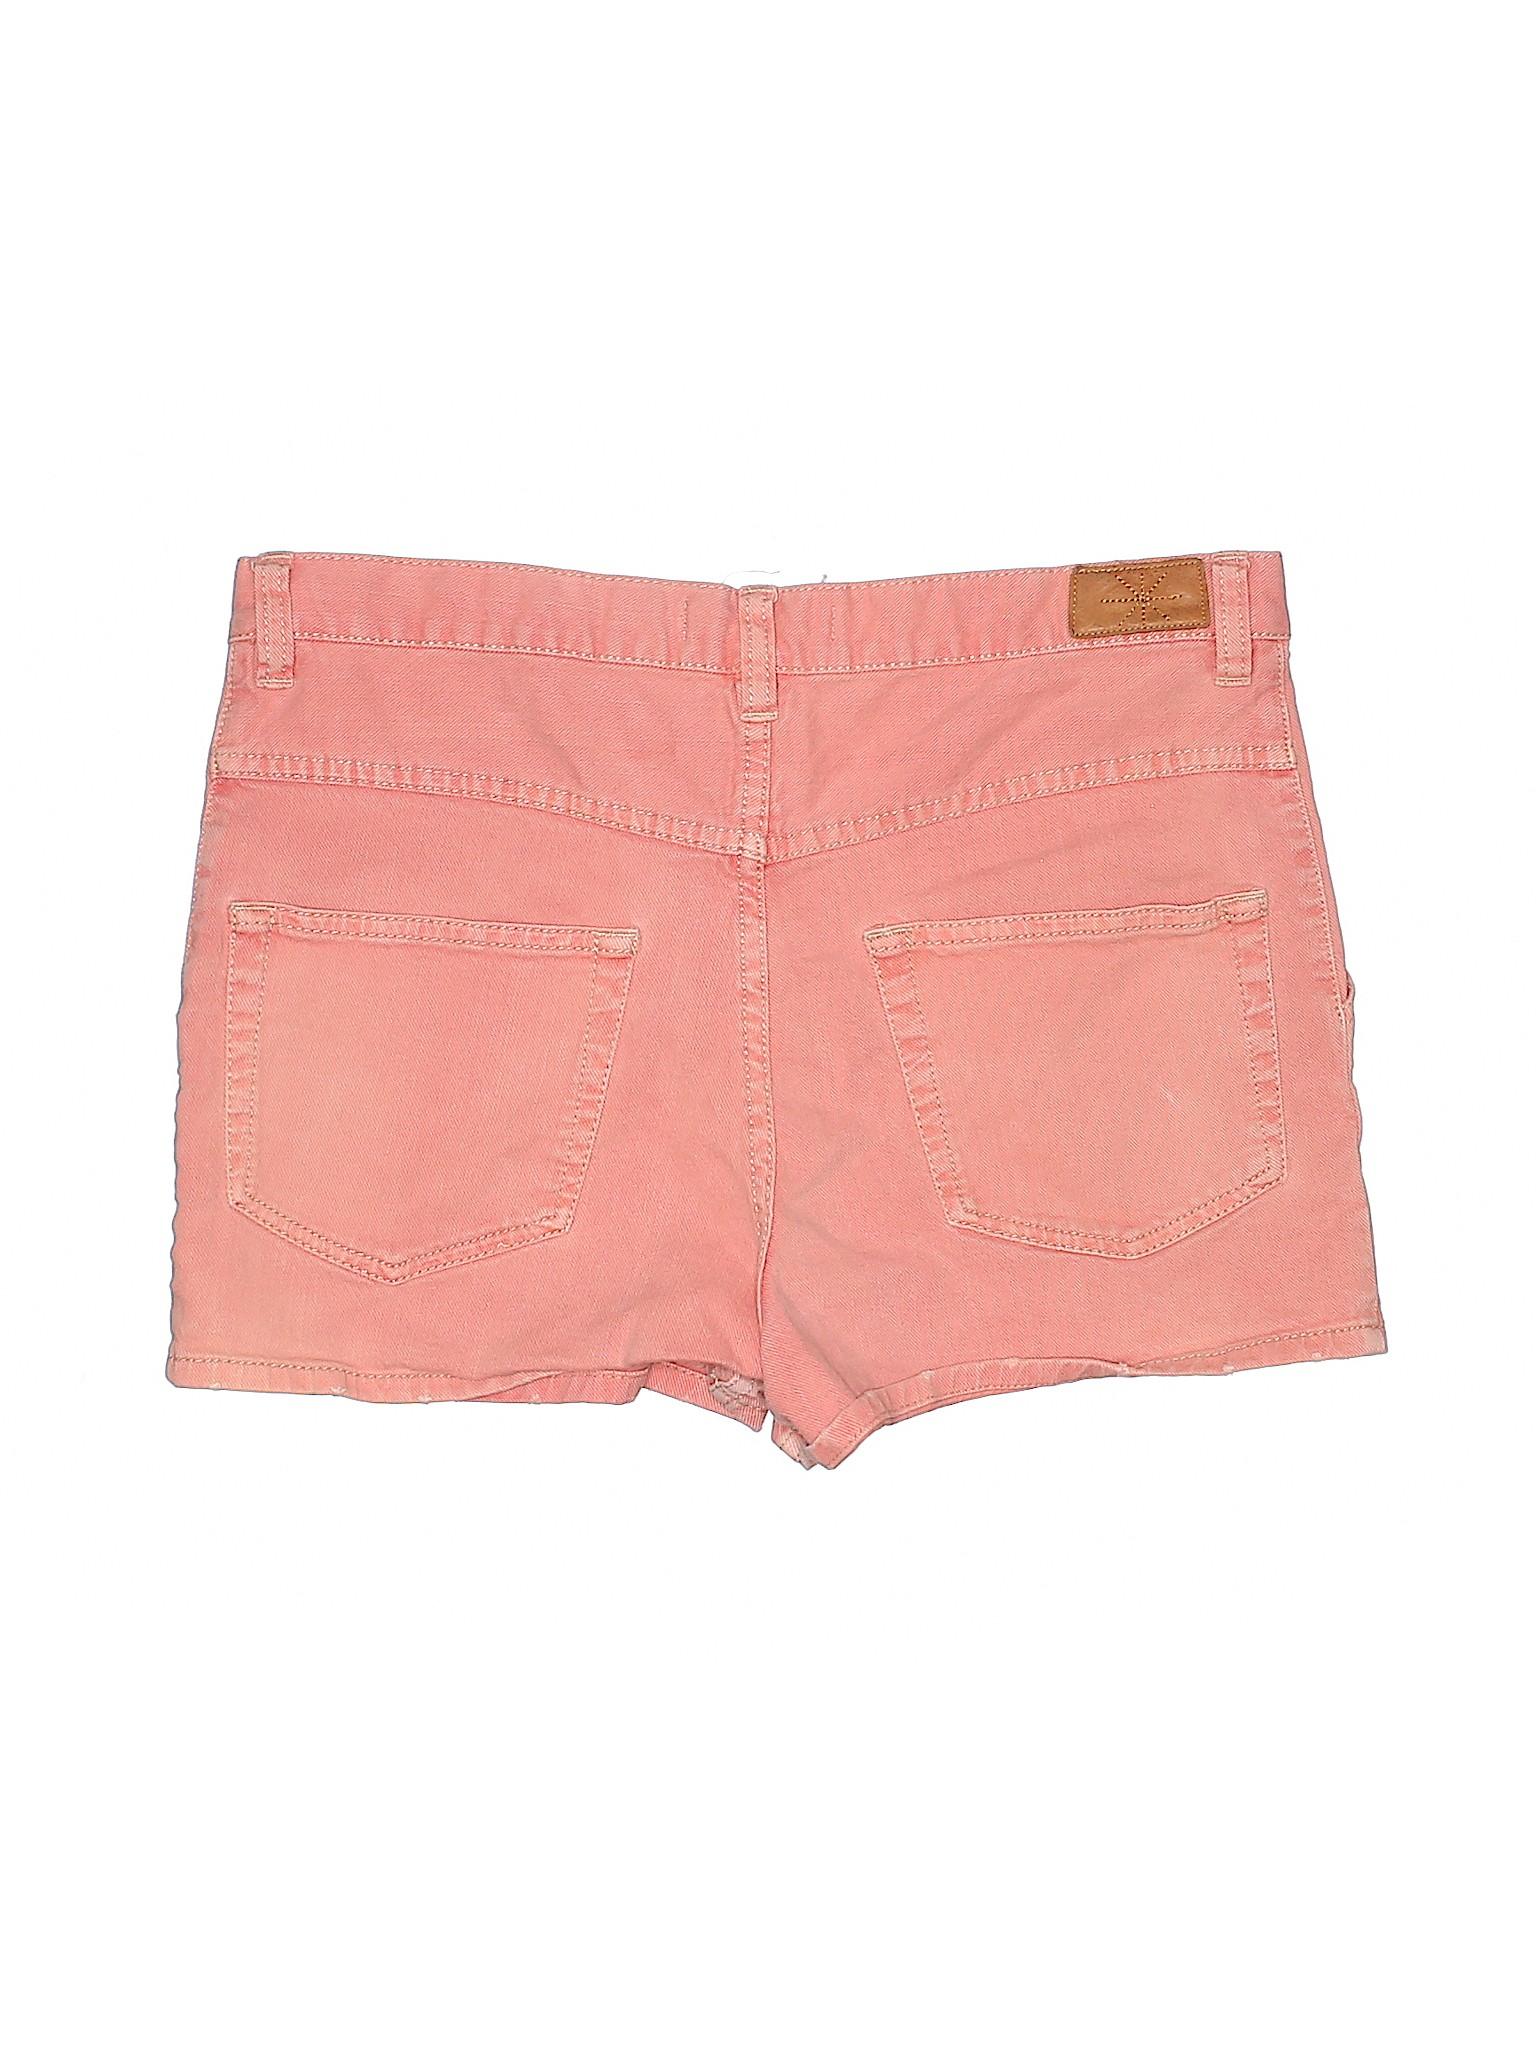 dd1ead091ca Étoile Isabel Marant Solid Coral Denim Shorts Size 36 (FR) - 80% off ...